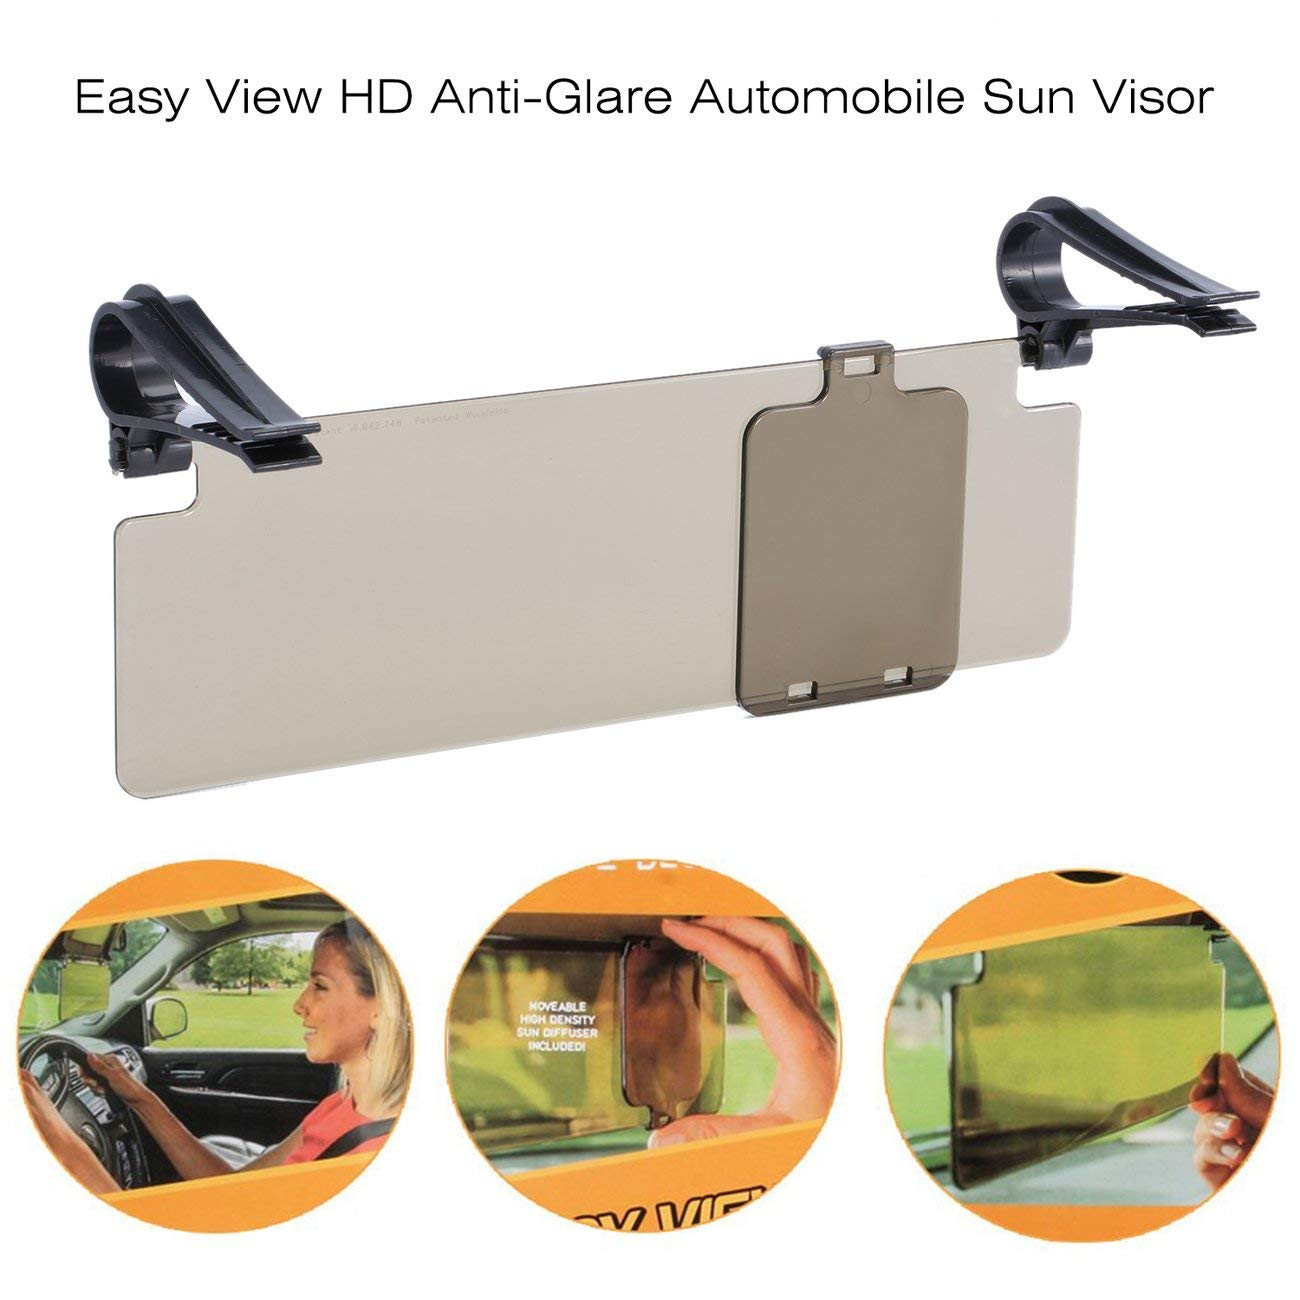 HD Car Sun Visor Goggles for Driver Day Night for Anti-Glare uv Blocker Anti-Dazzle Mirror Car Clear View Dazzling Goggles Grey -MENYUNYIJI